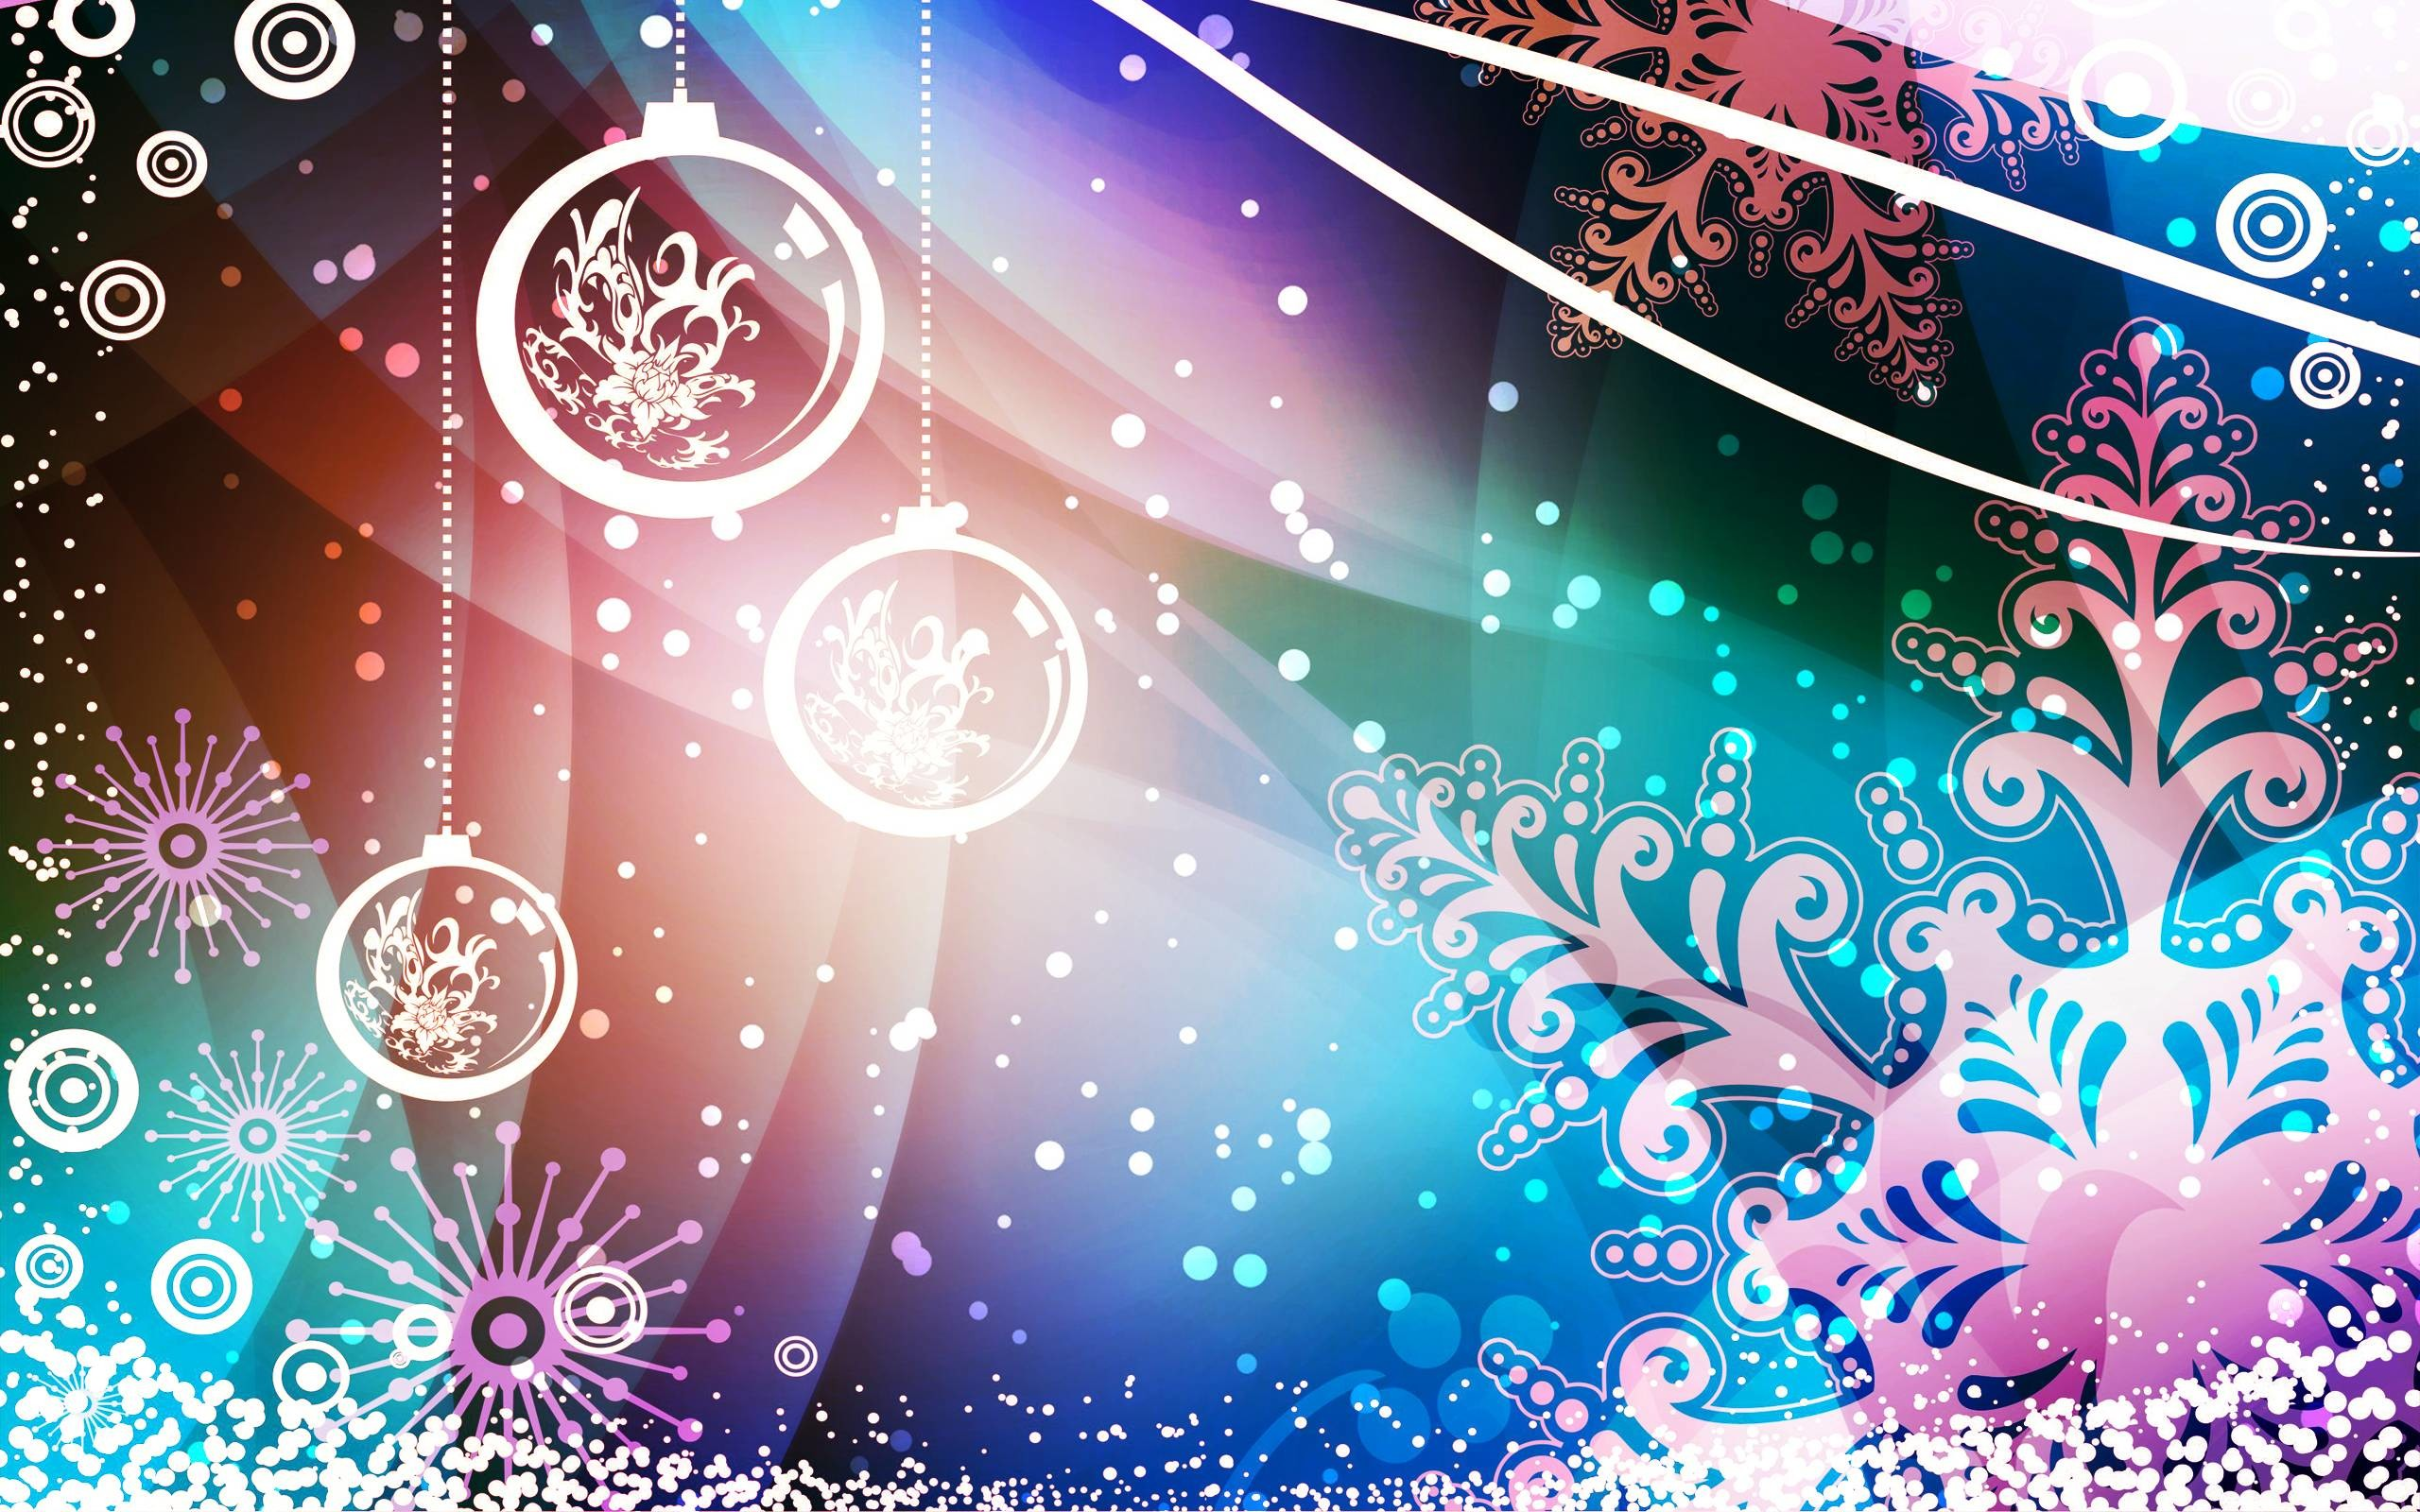 Xmas Stuff For > Christmas Wallpaper Backgrounds Desktop